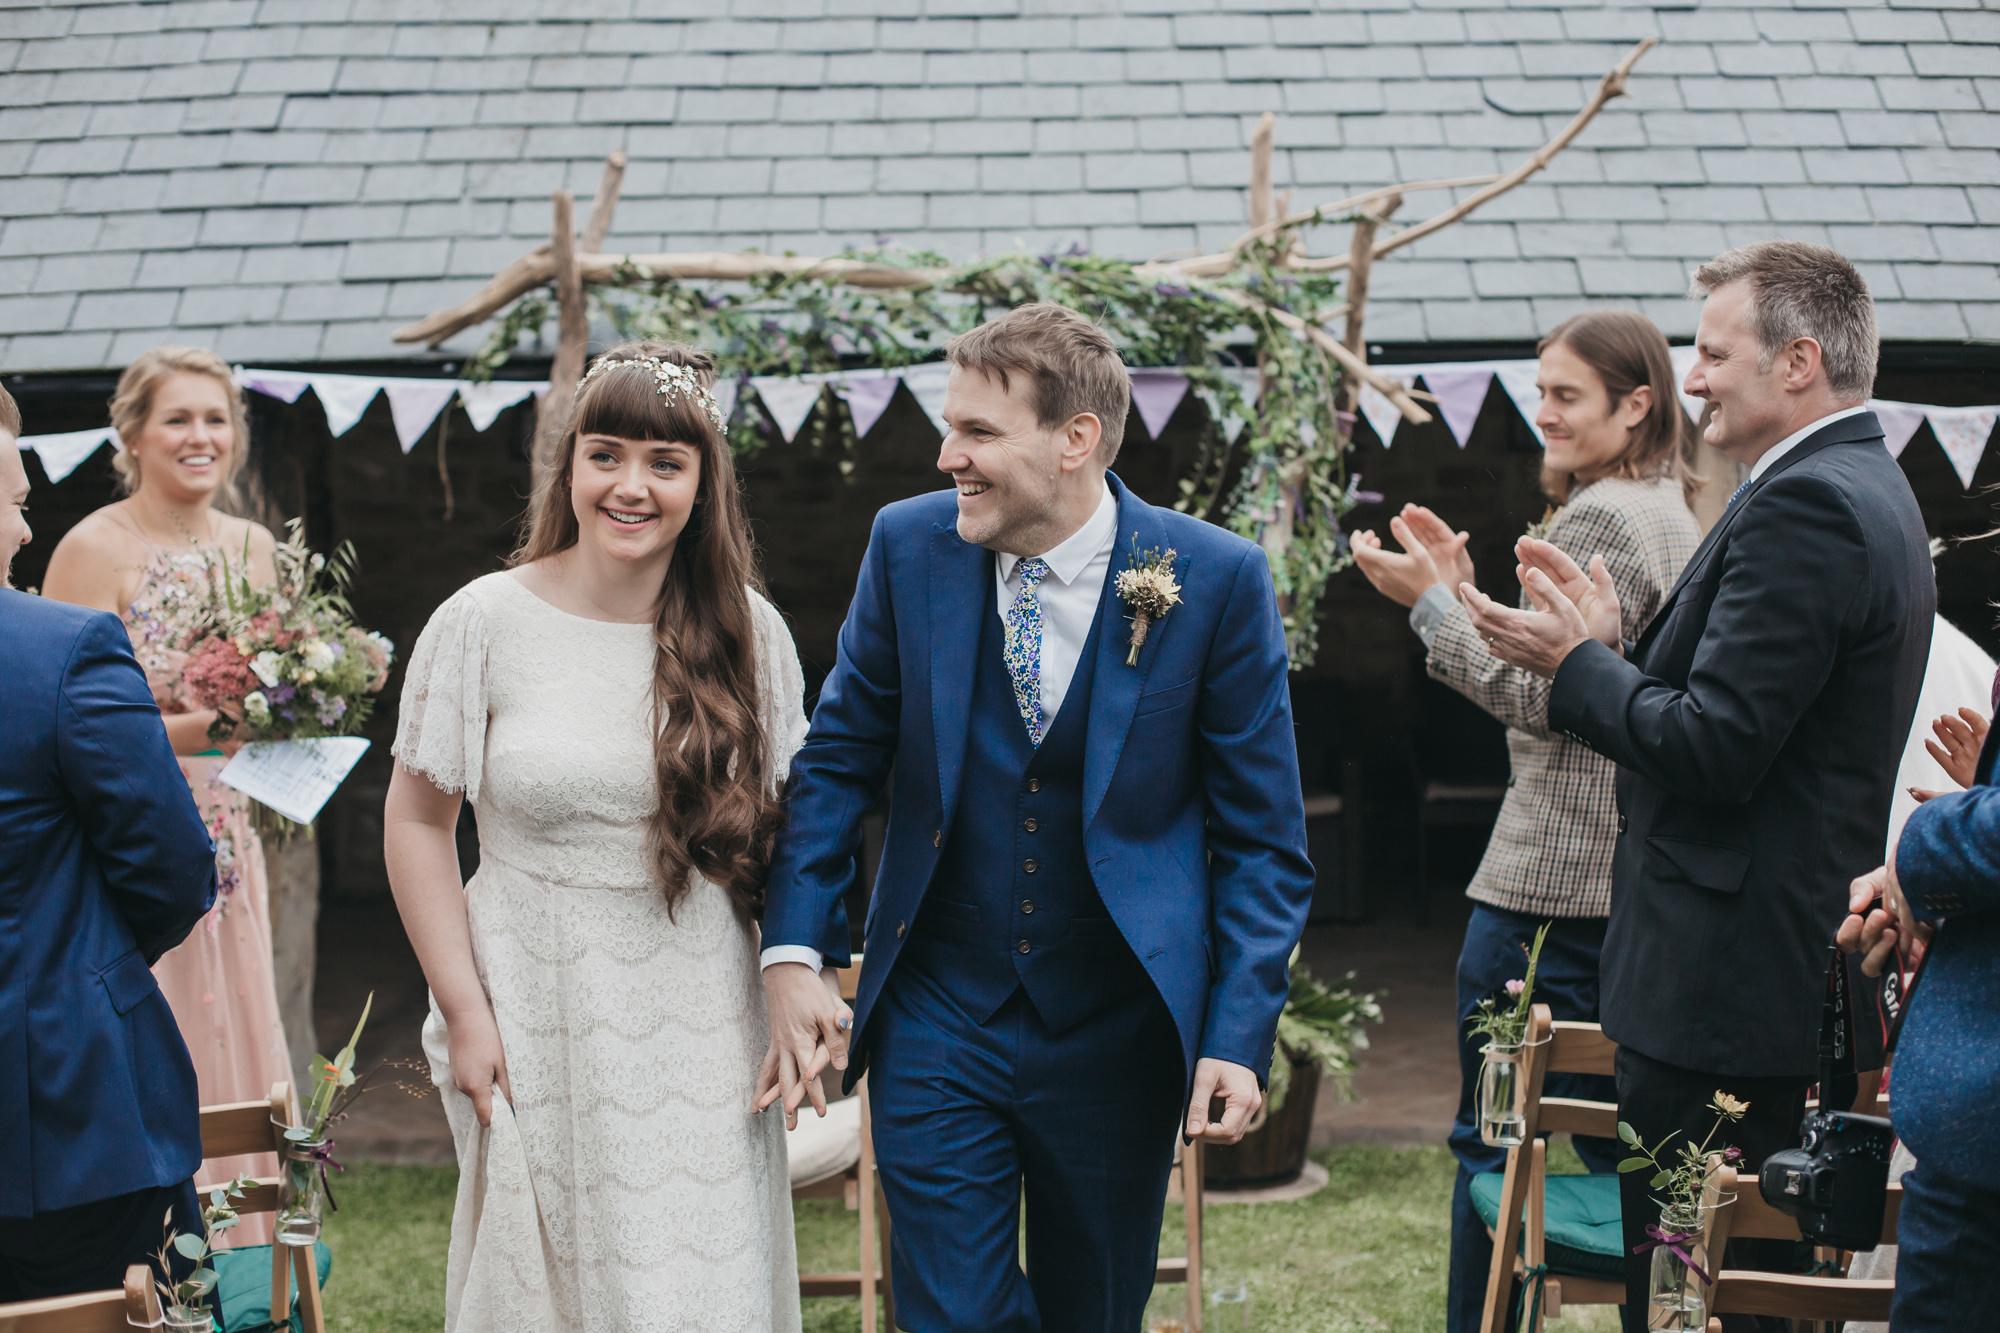 Kristy-Back-Garden-Outdoor-Wedding-Sheffield-Industrial-Warehouse-Wedding-Bohemian-Kate-Beaumont-Dahlia-Dress-19.jpg